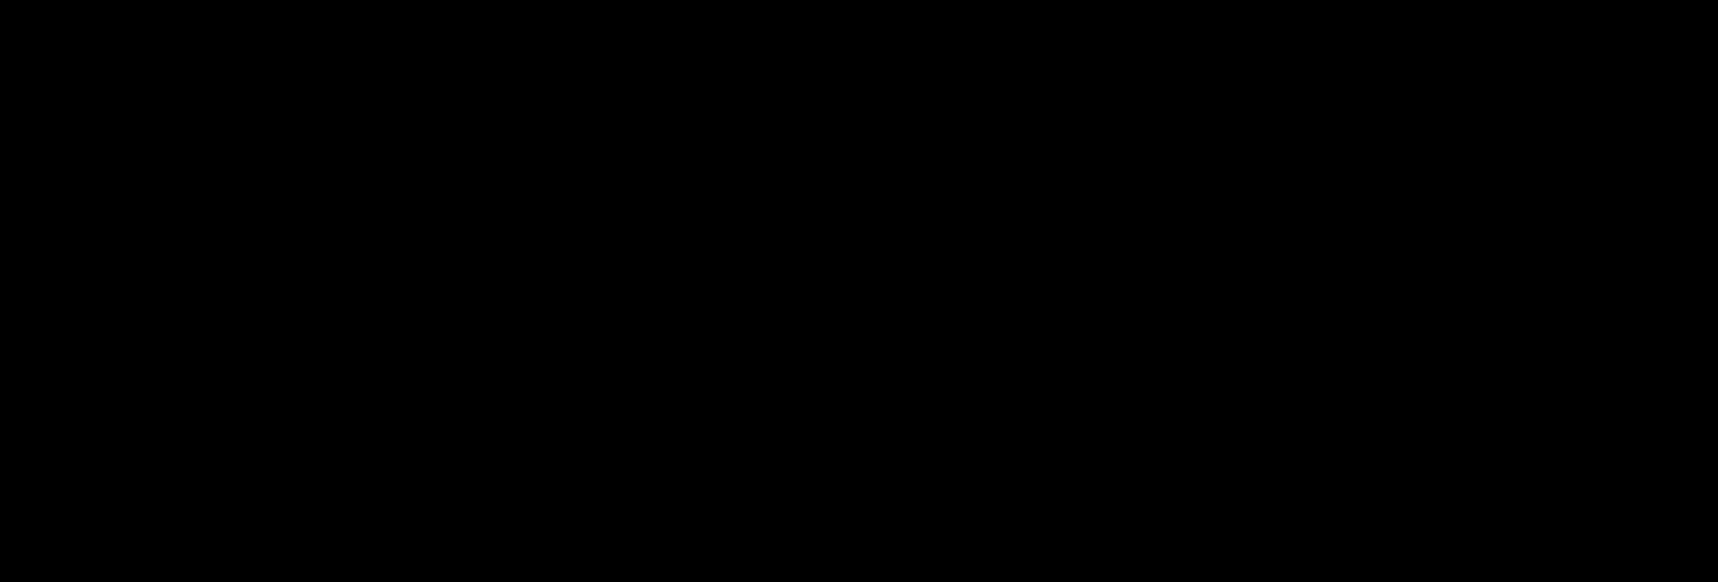 image75.png